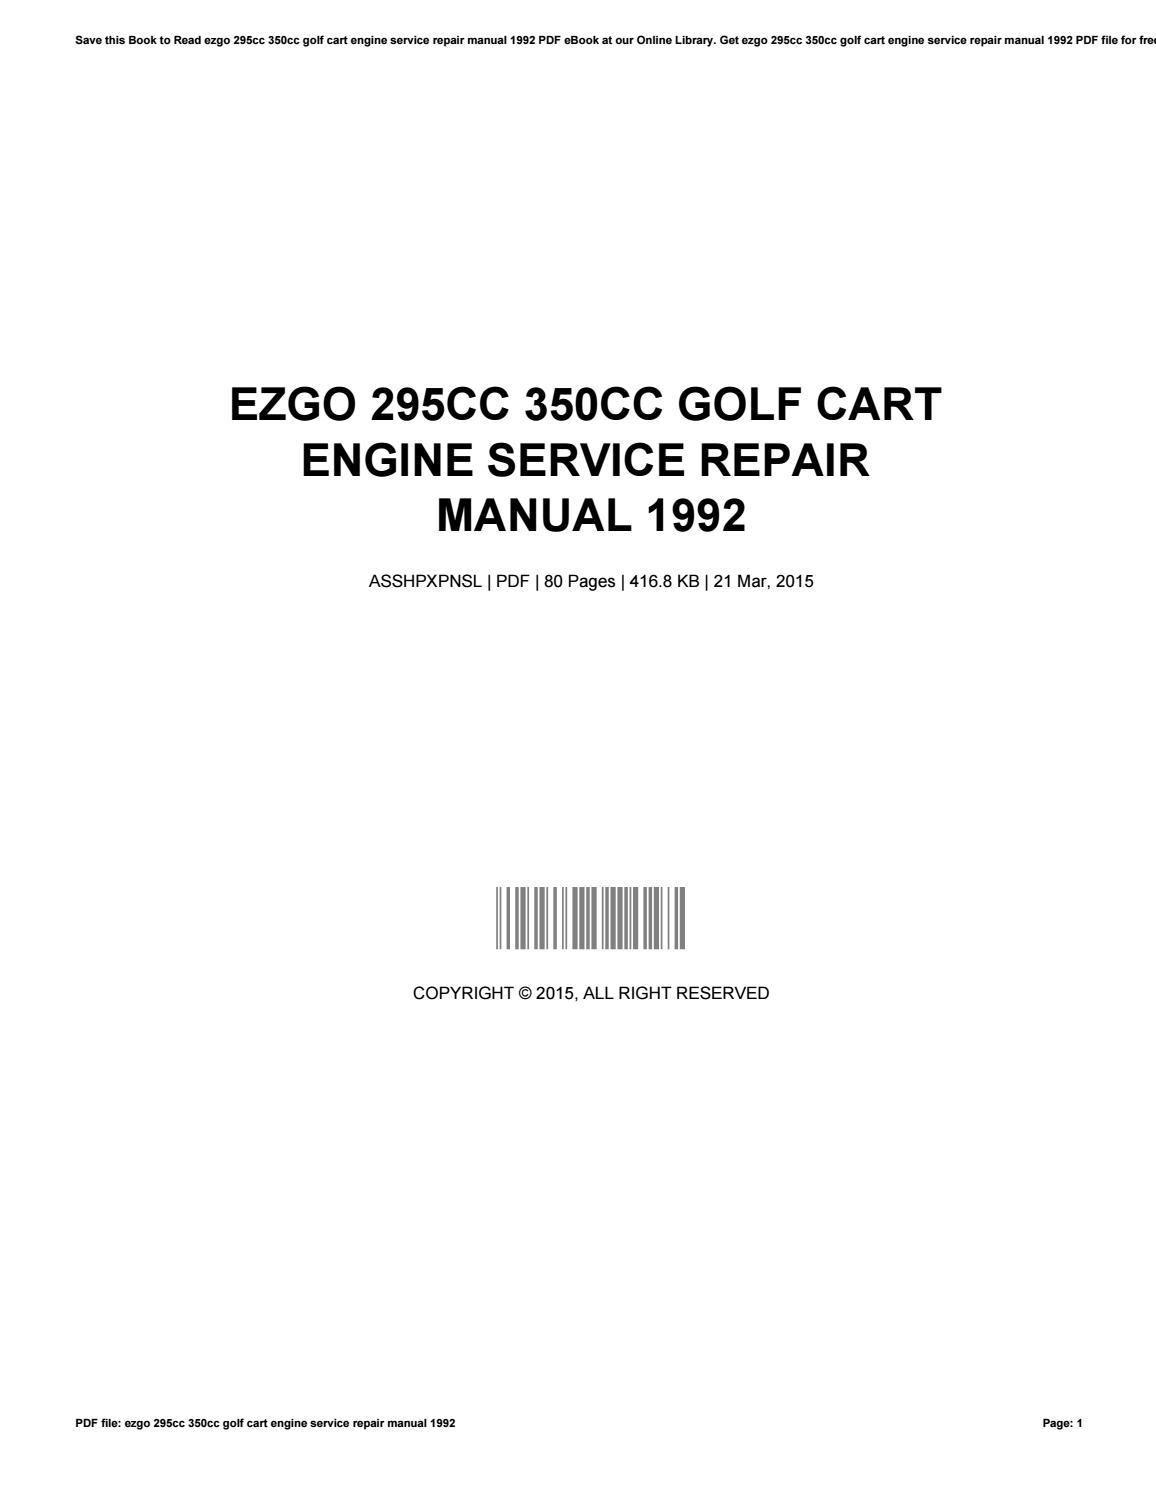 Ezgo Cart Manual Engine Schematics Golf Service Repair Joycejackson Issuu 1156x1496